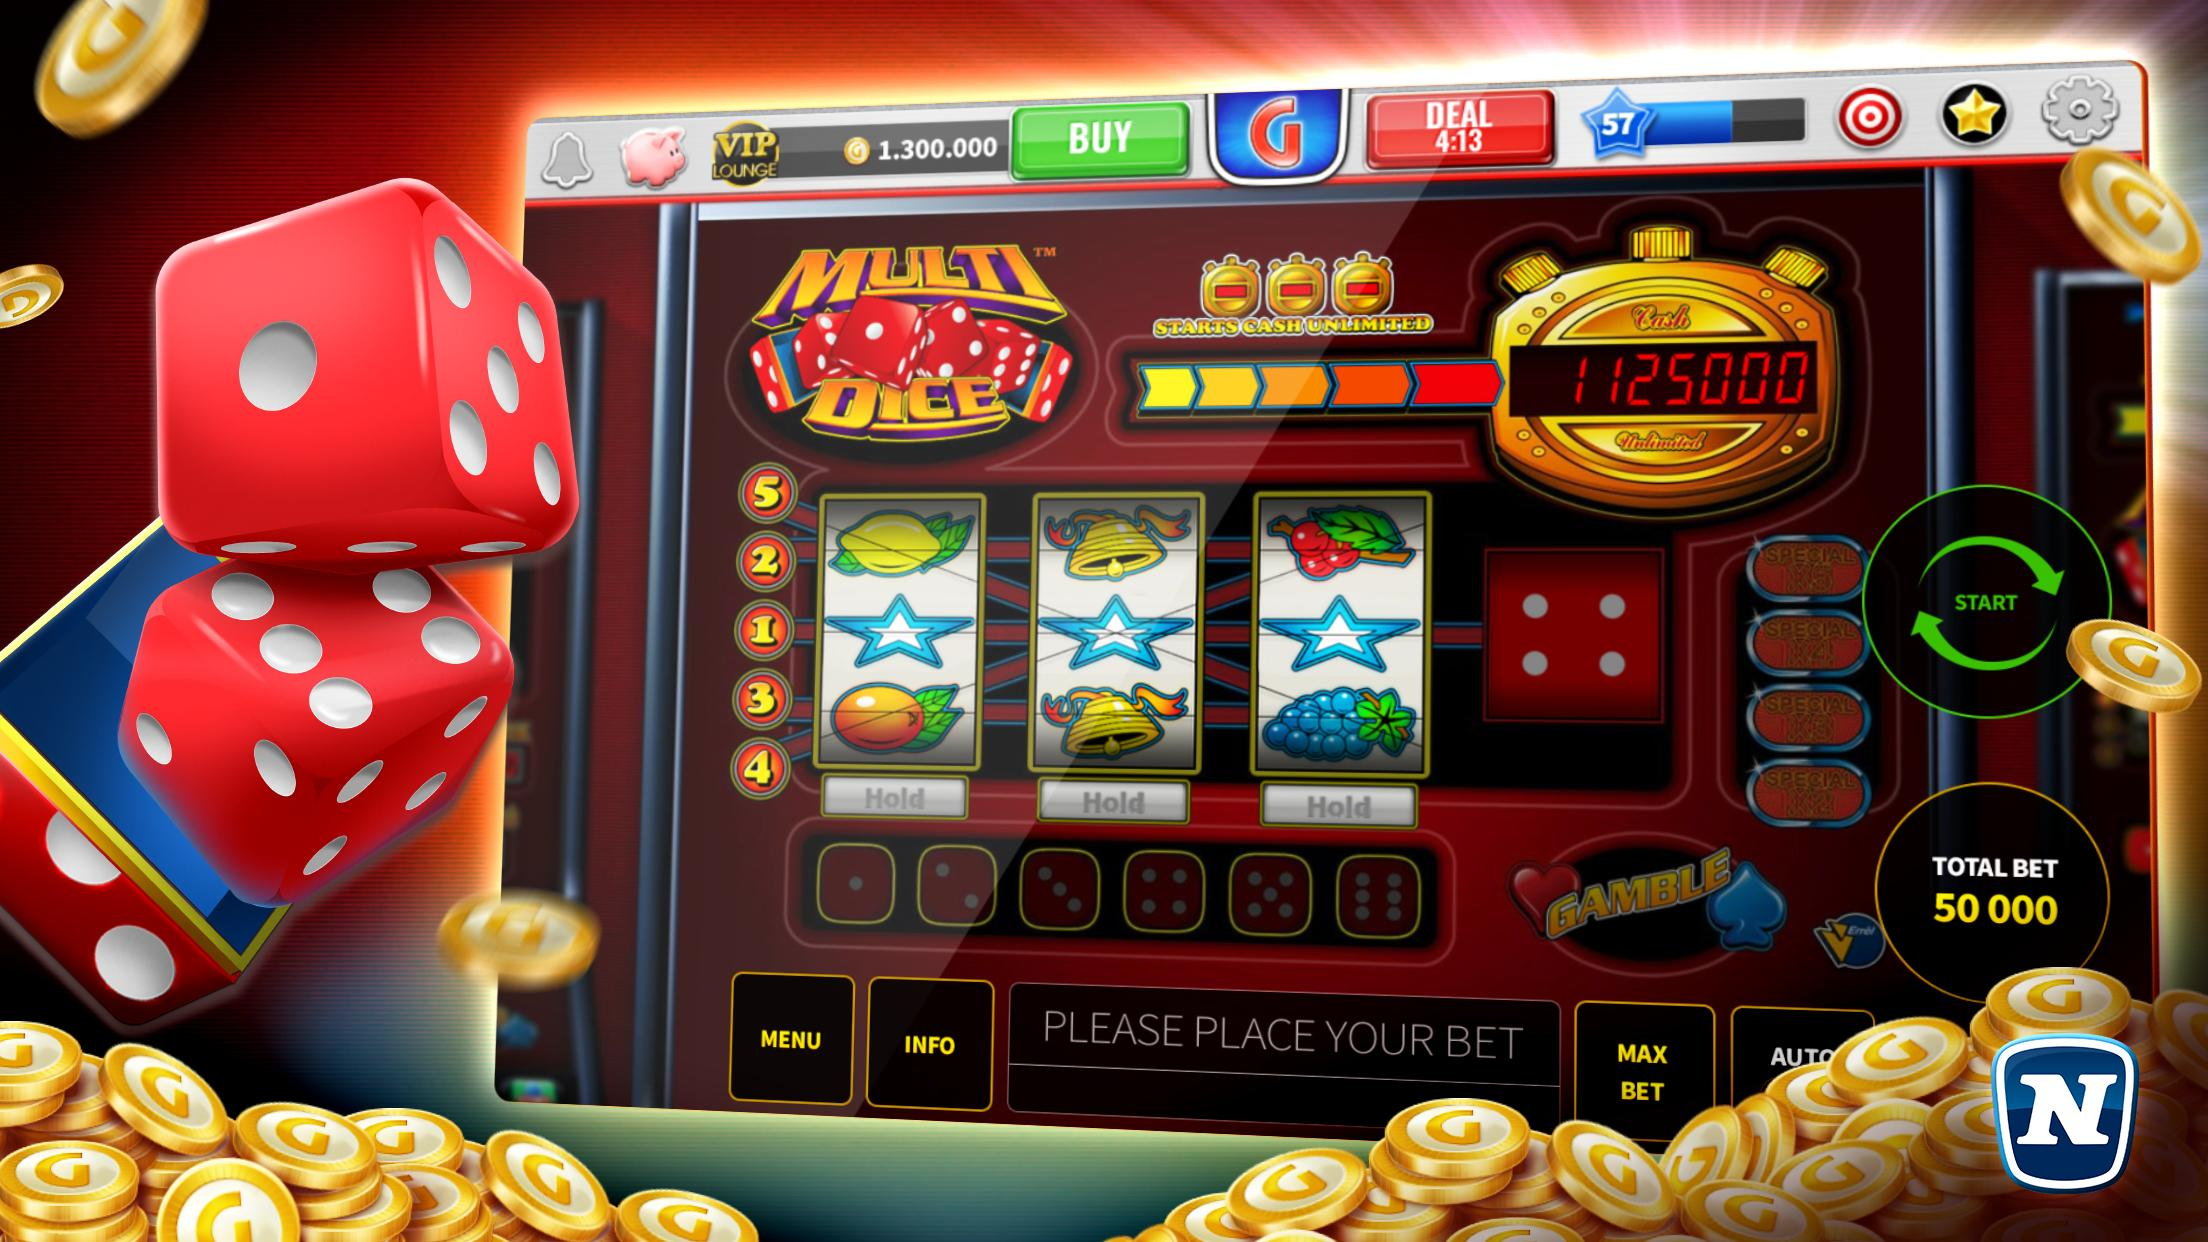 Hot Choice Slot Machine